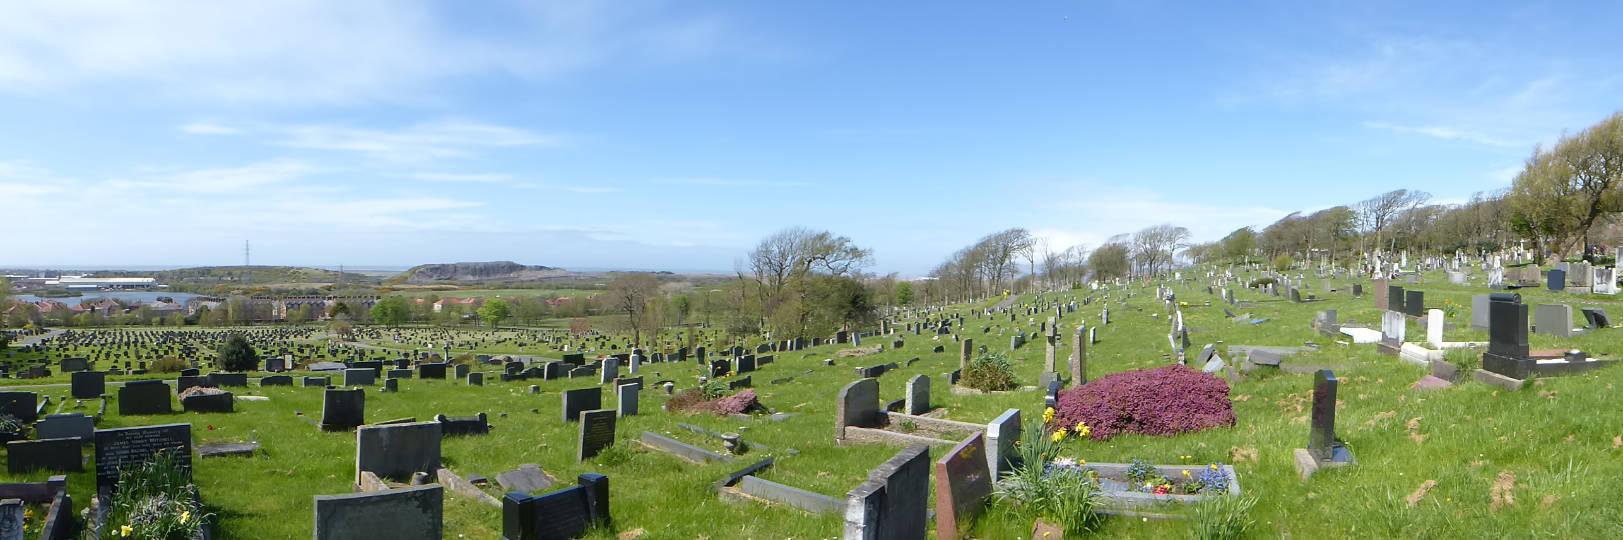 graves in furness - cemeteries graveyards, barrow, dalton, ireleth, askam, walney, rampside, ulverston